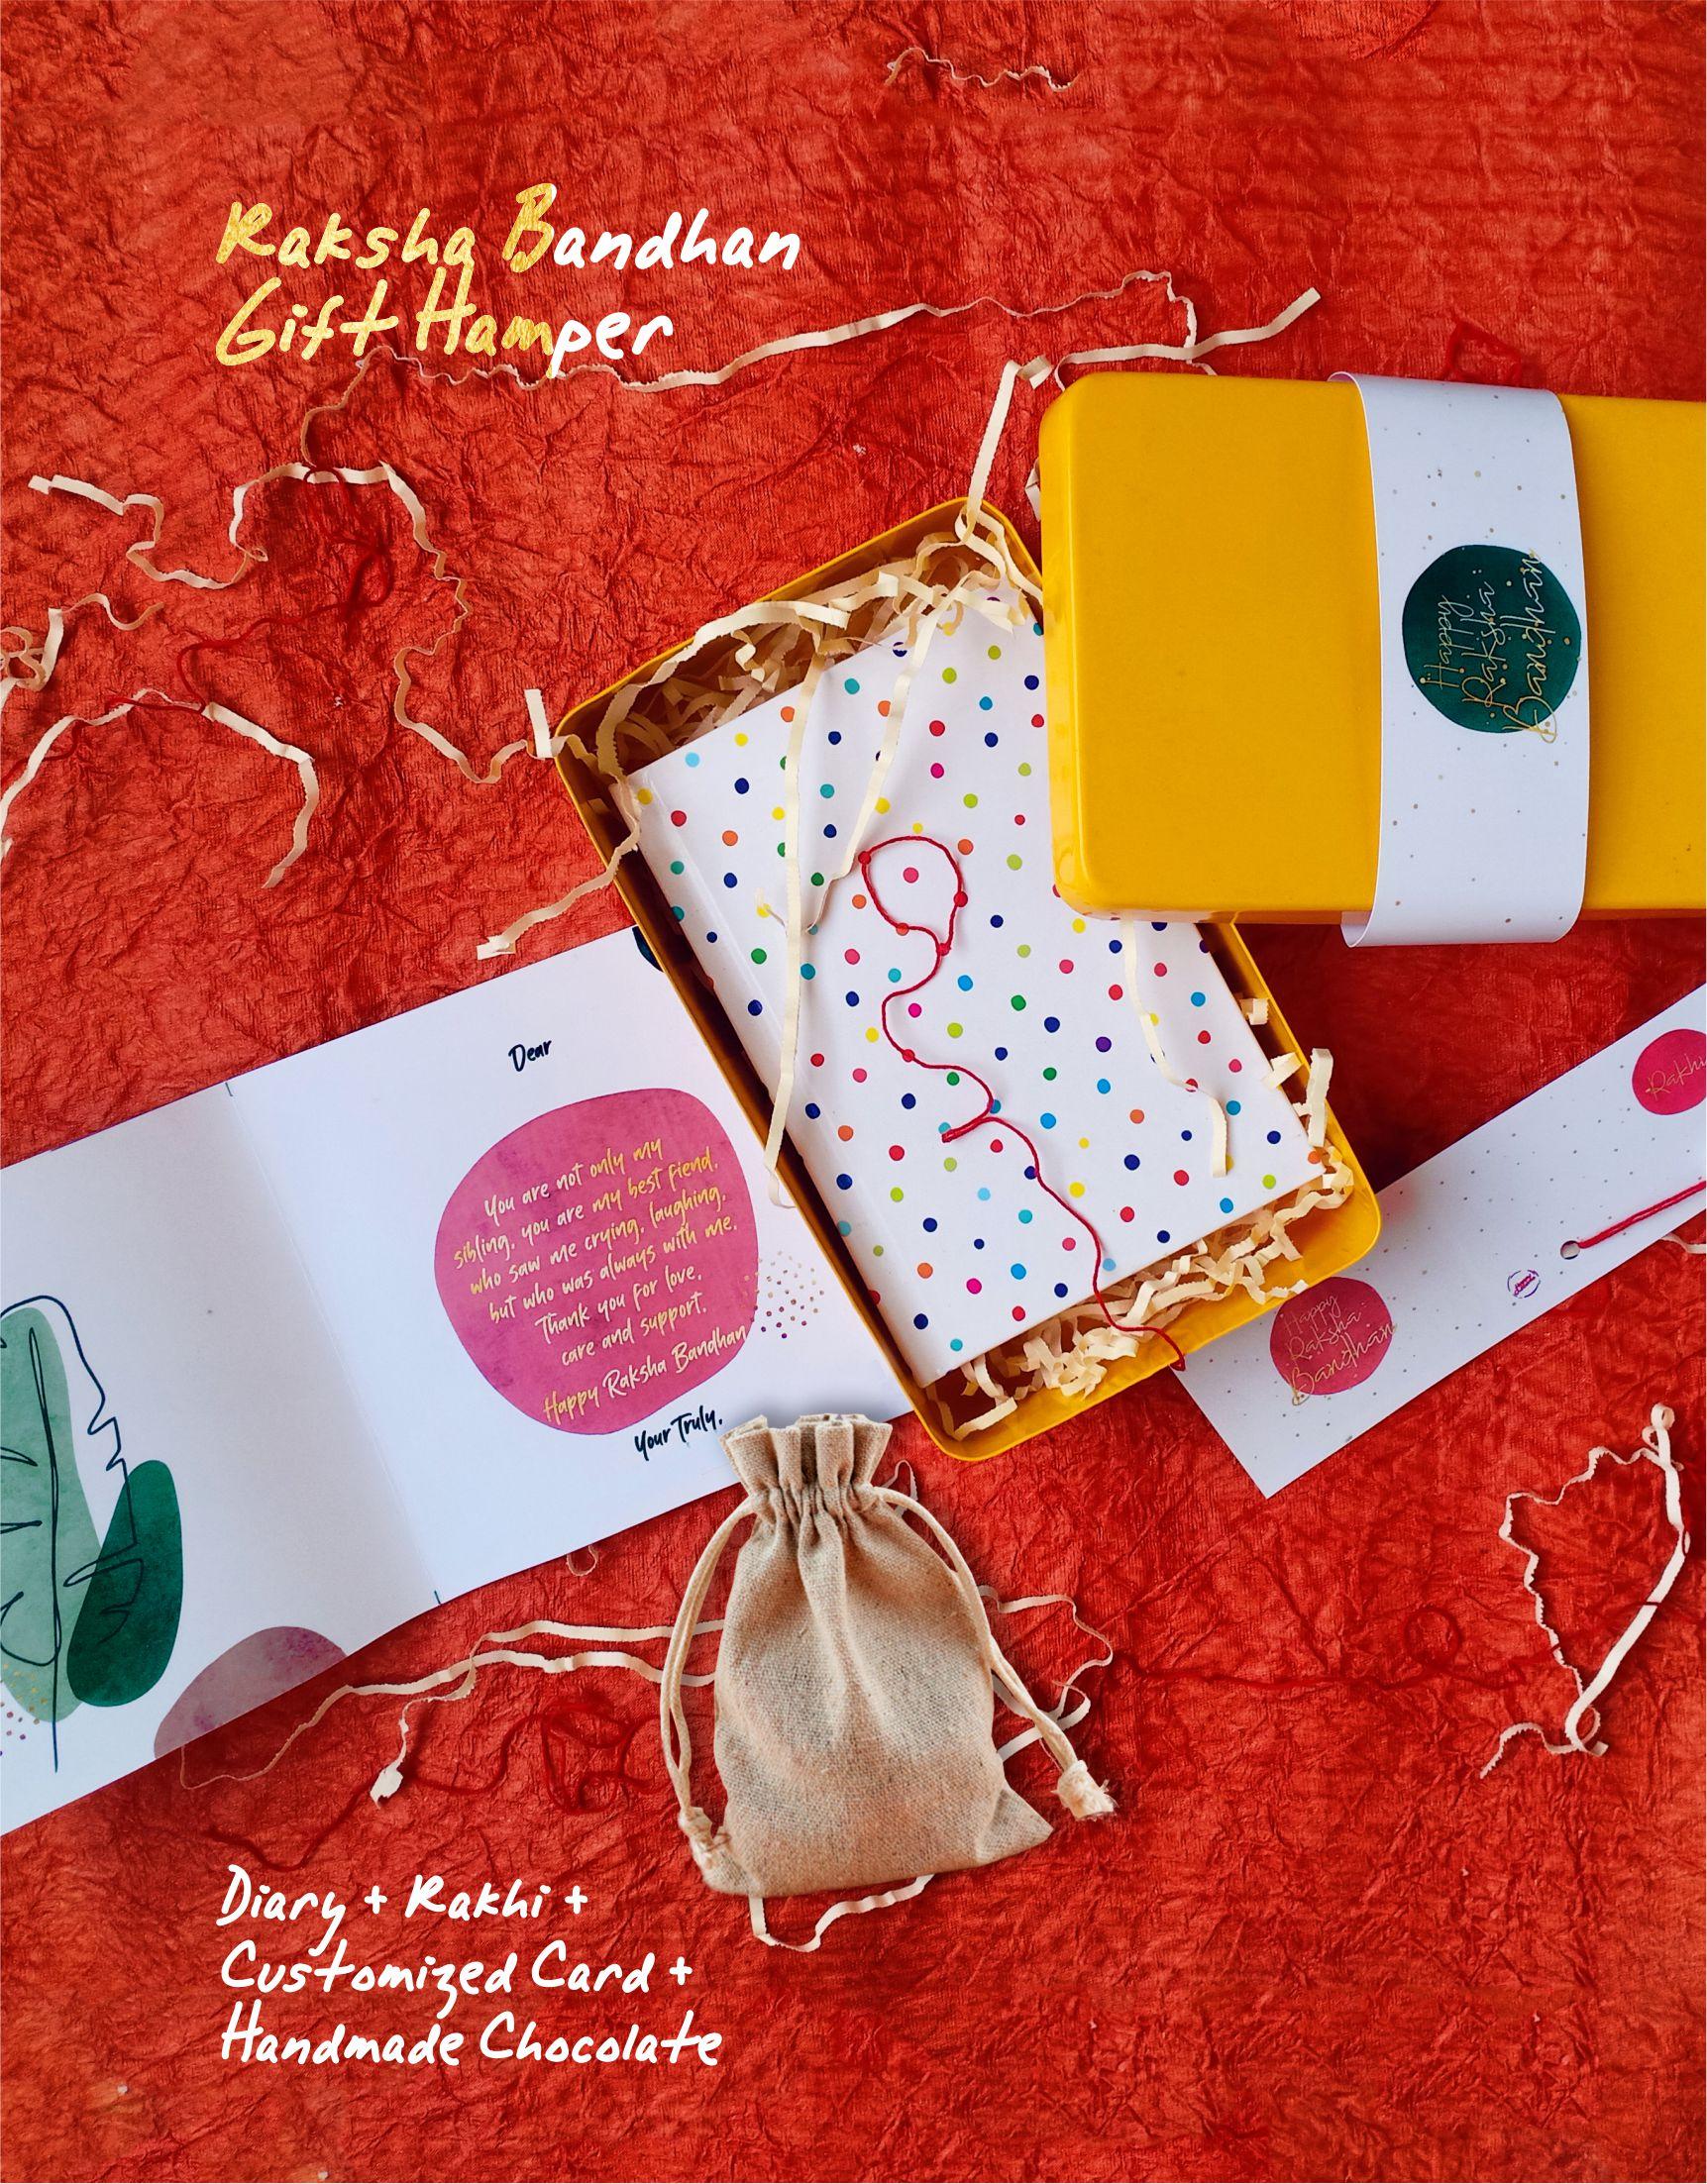 Raksha Bandhan Gift Hamper Happy Outcome